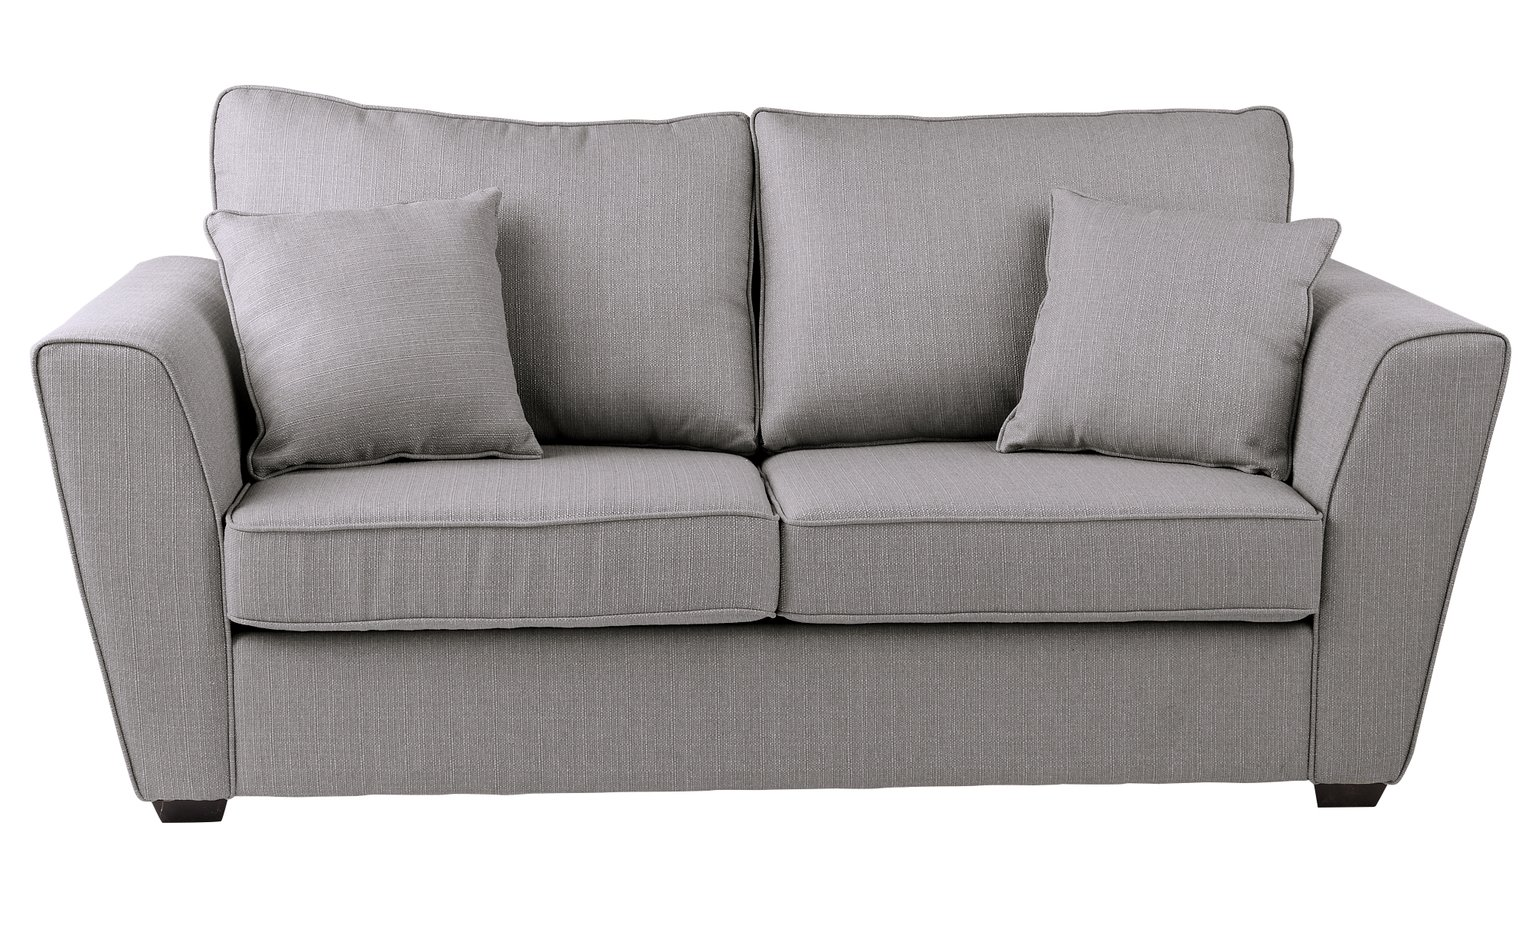 Argos Home Renley 2 Seater Fabric Sofa Bed - Light Grey